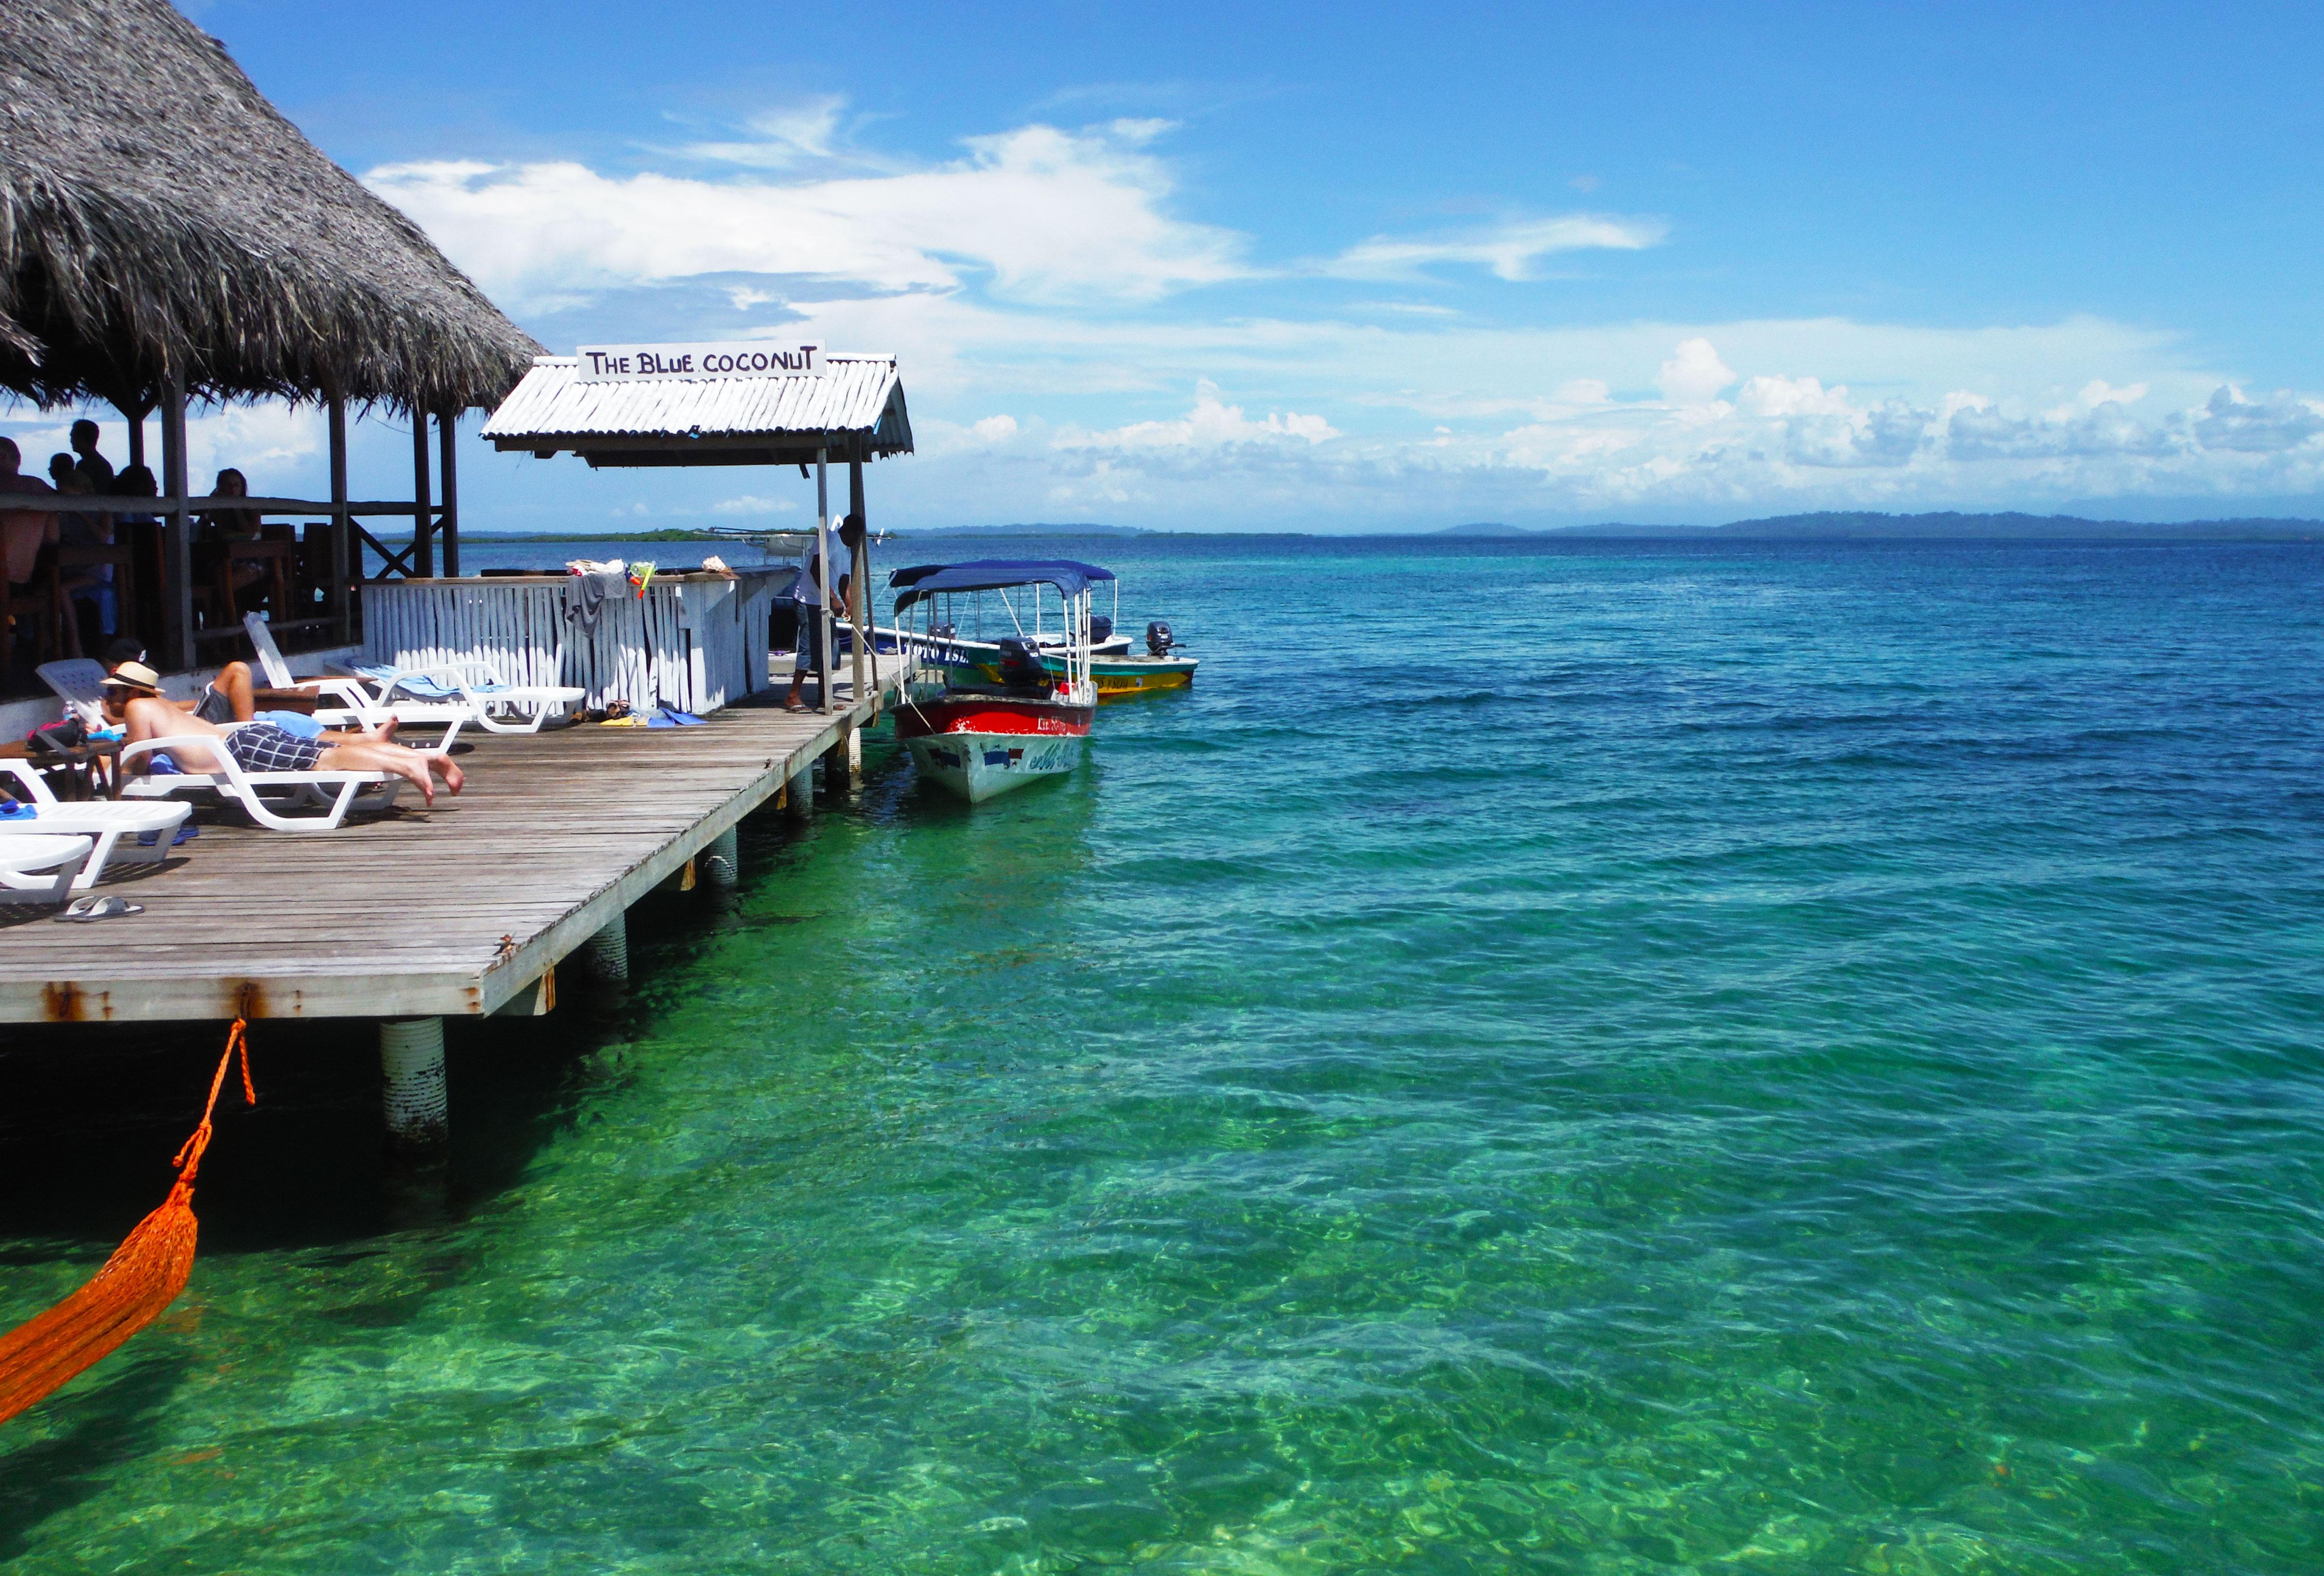 south america Honeymoon - costa rica - Isla Solarte